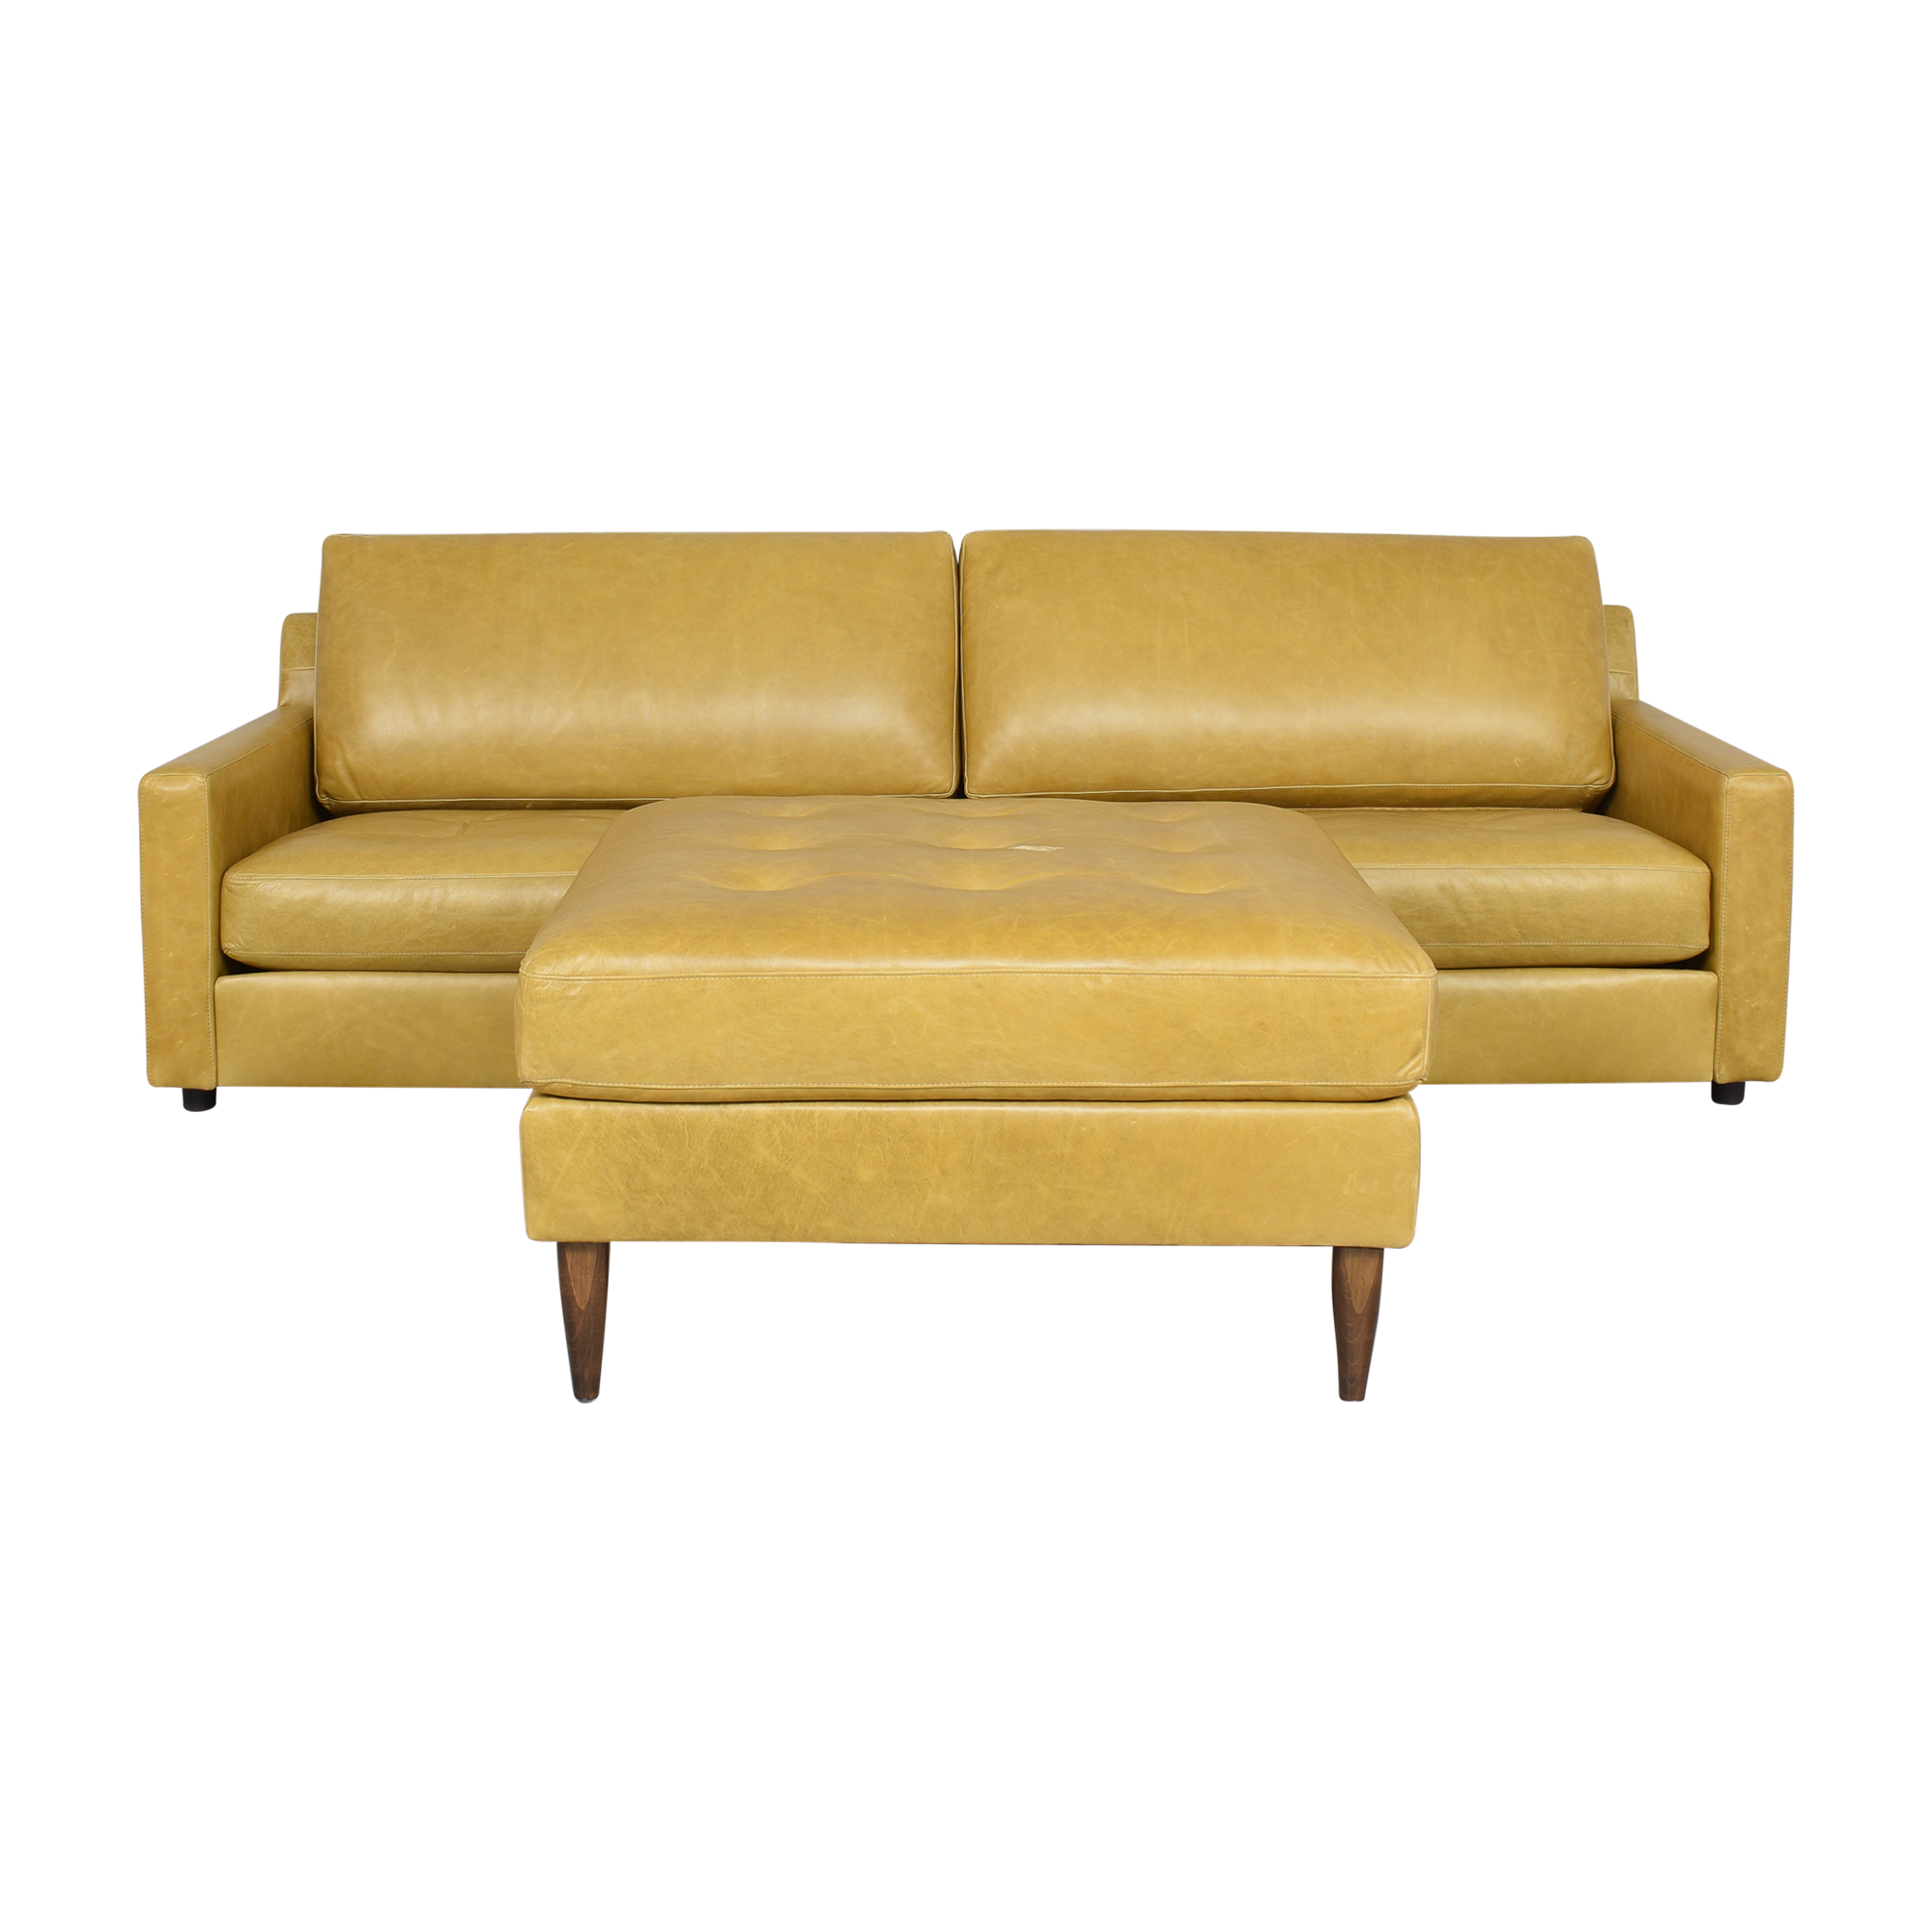 BenchMade Modern BenchMade Modern Skinny Fat Sofa and Ottoman Classic Sofas